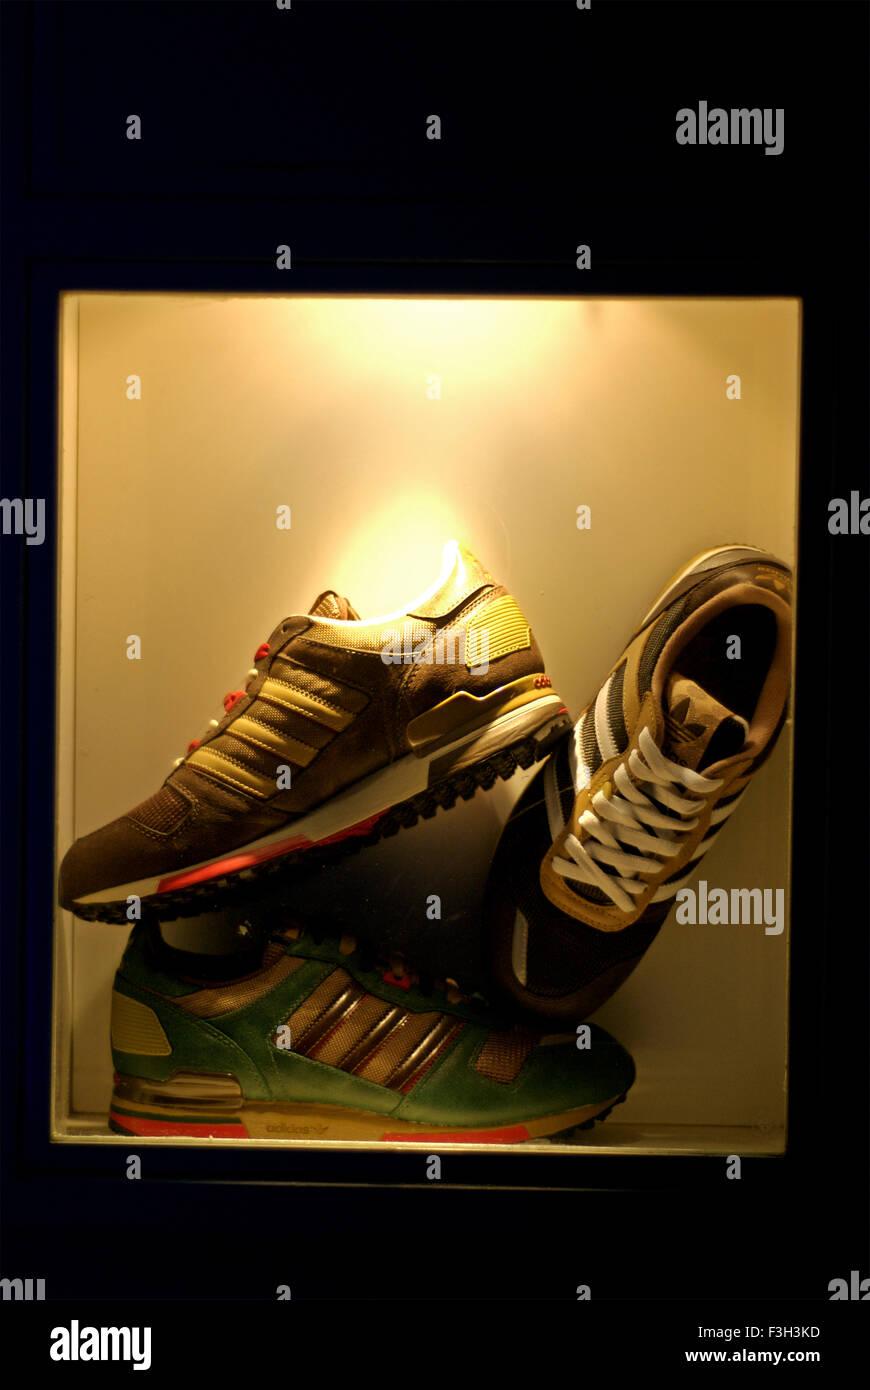 adidas england scarpe